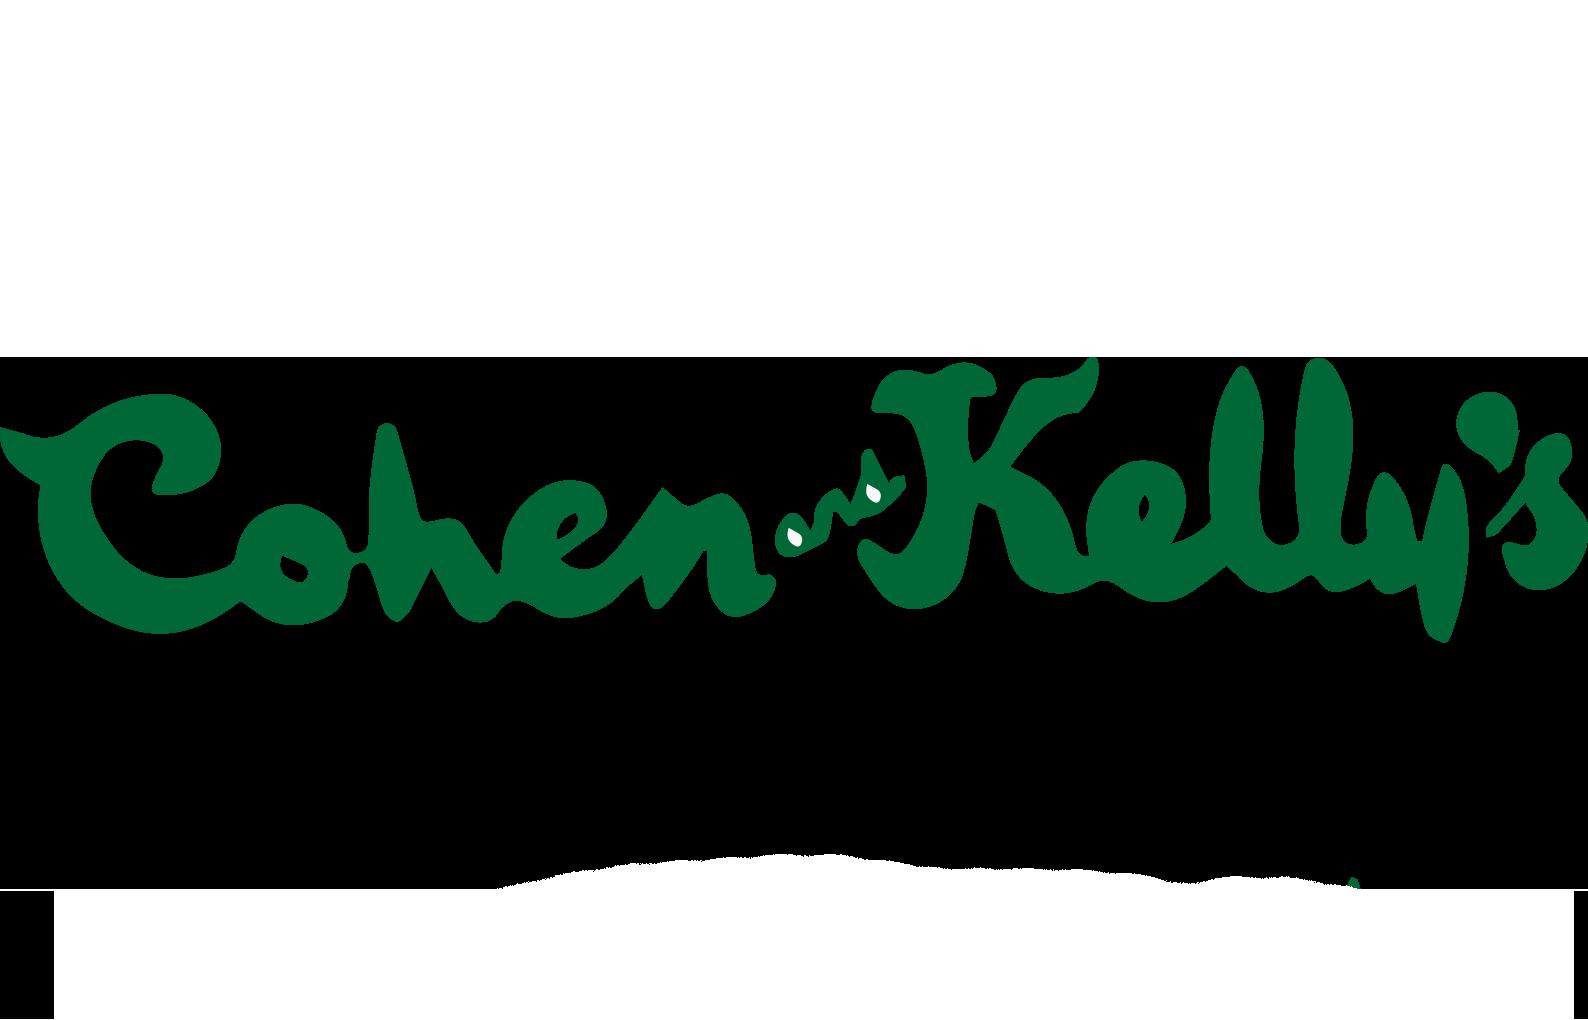 Cohen & Kelly's Lounge